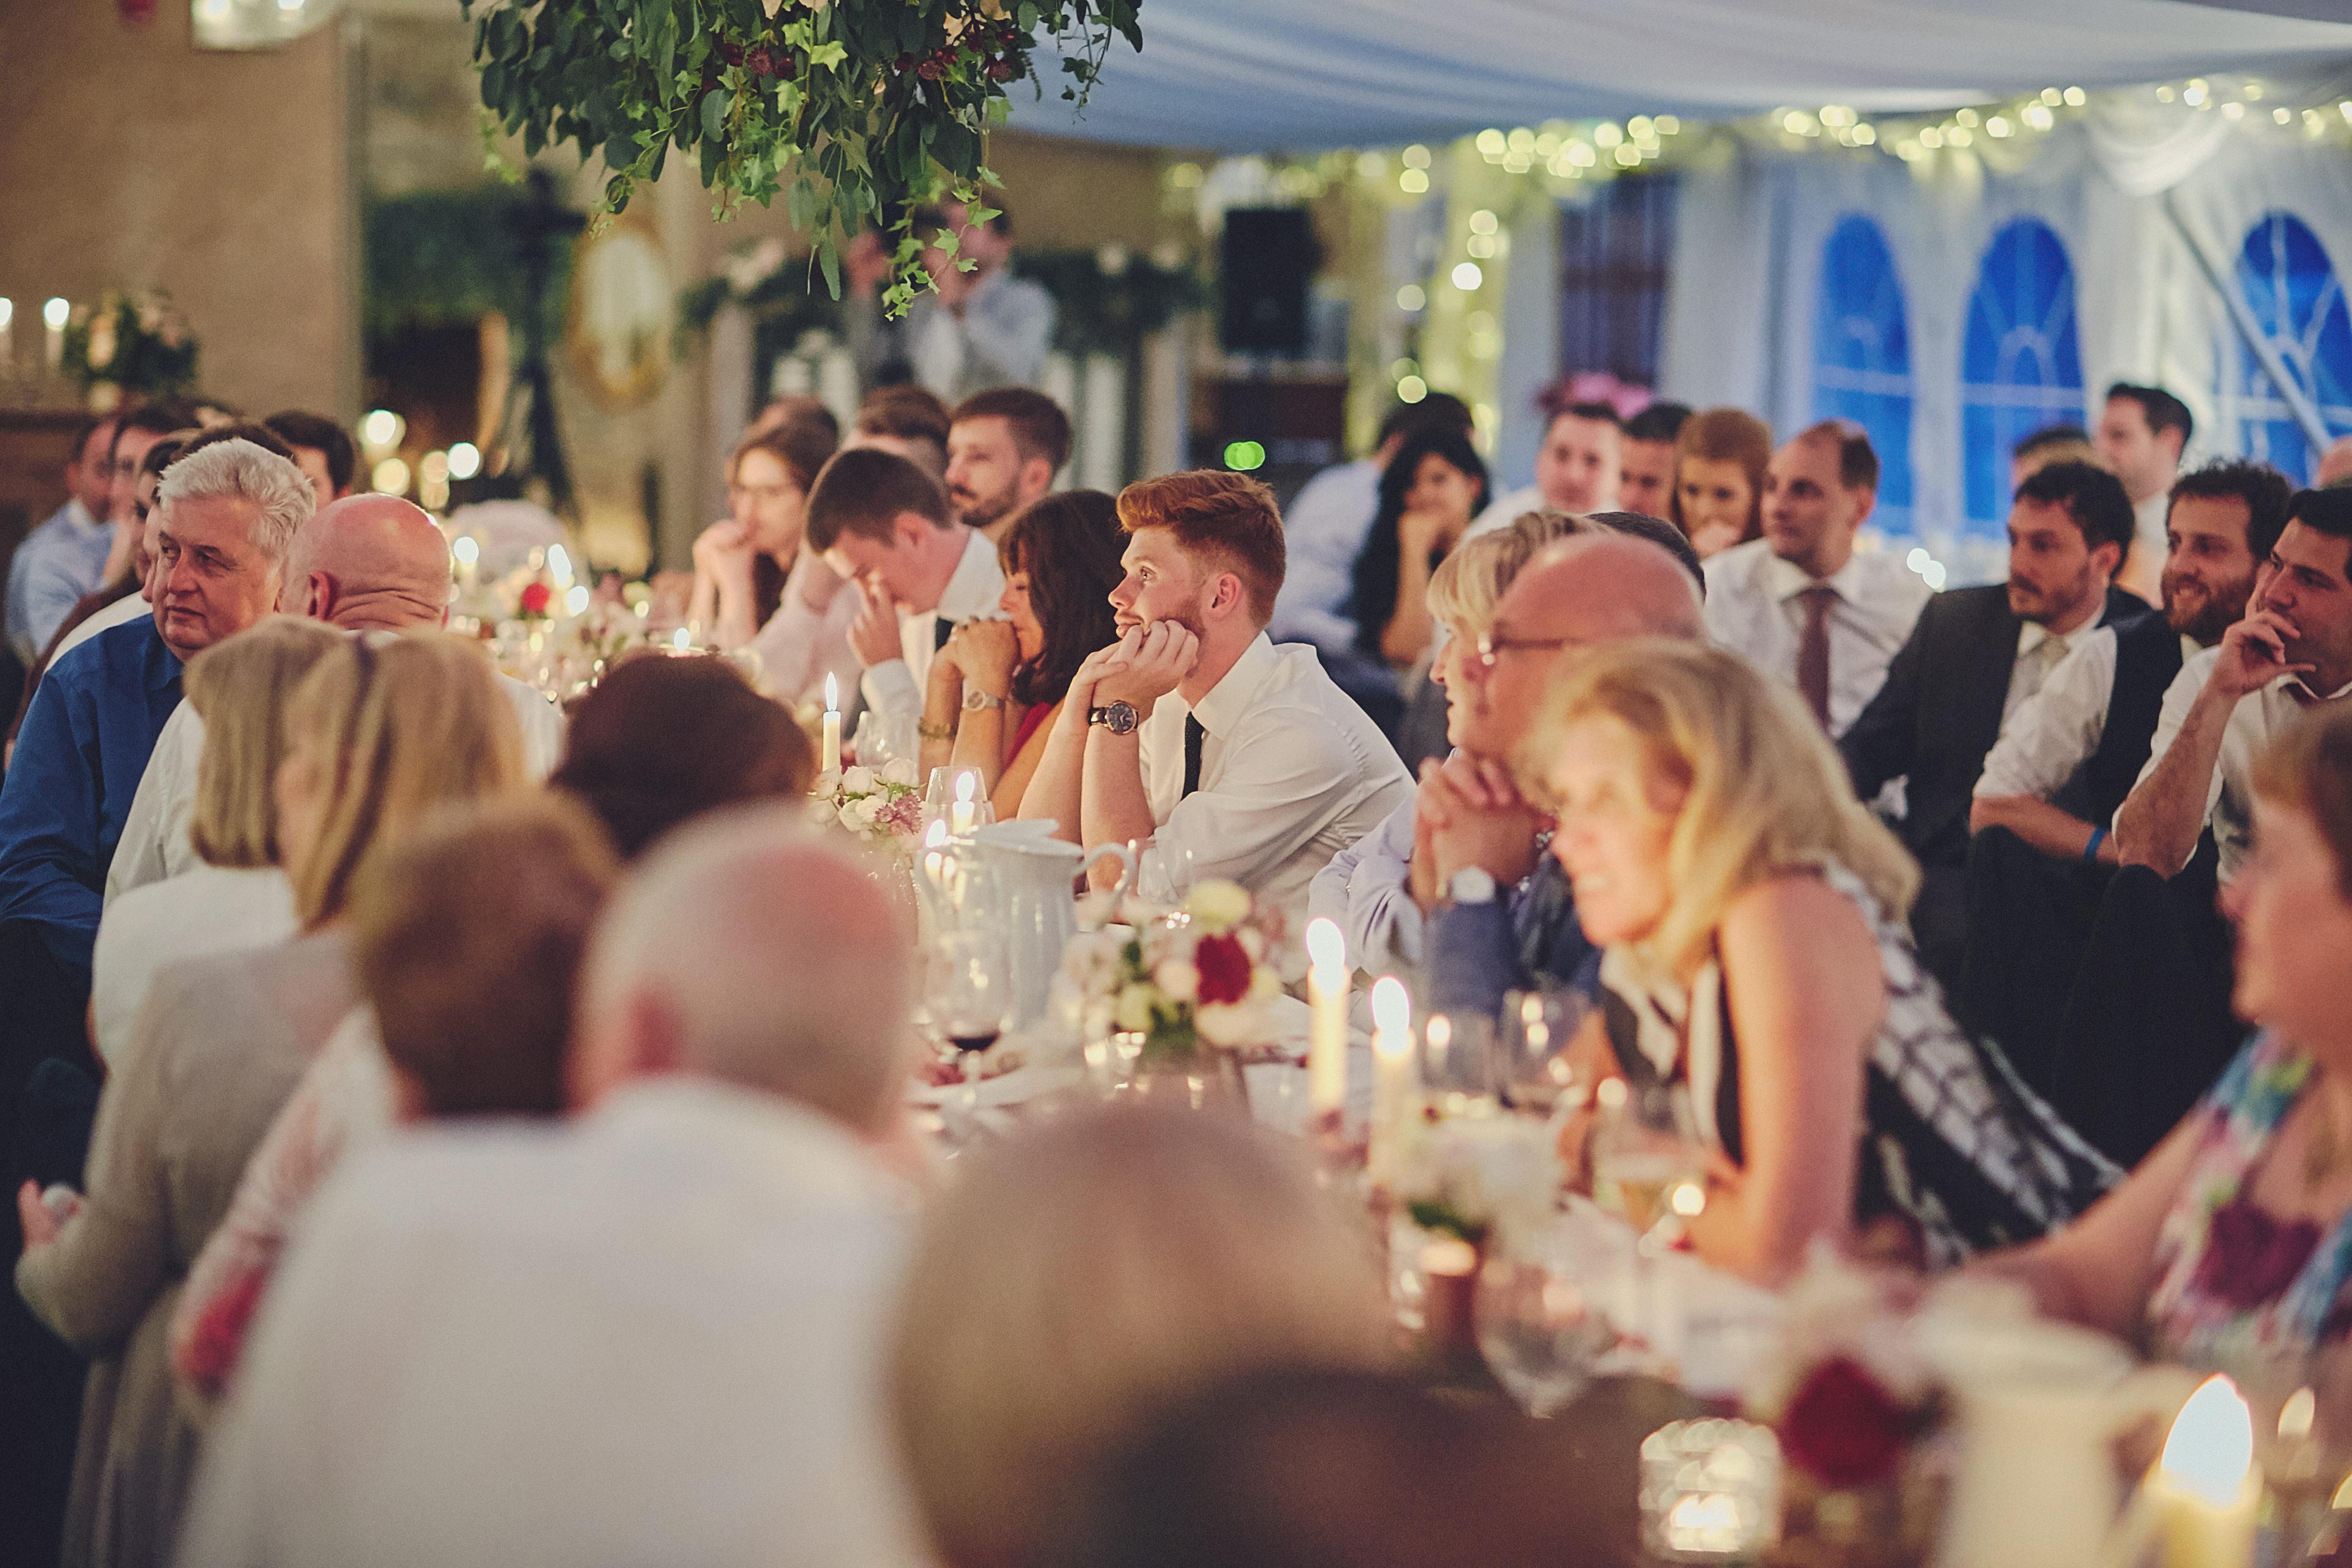 Cloughjordan House weddding143 - Cloughjordan House Wedding - Alternative Venue